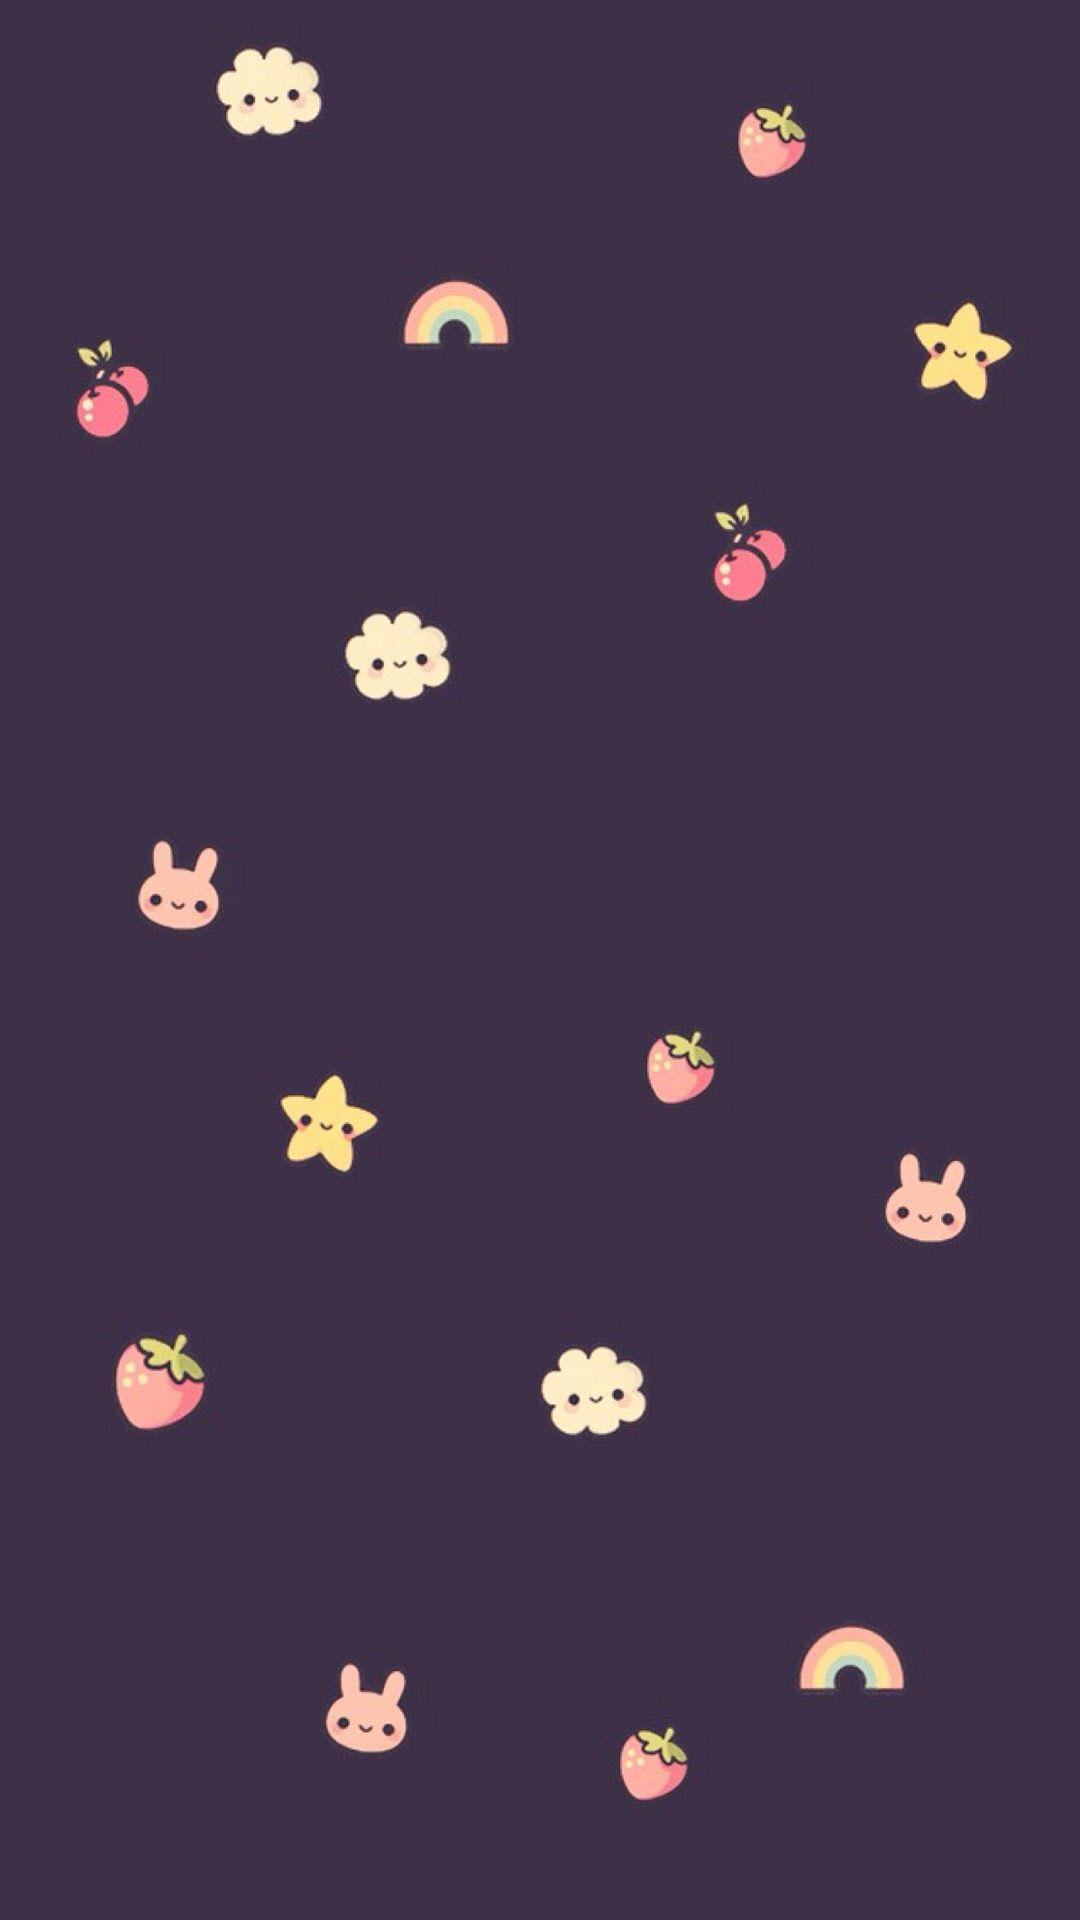 Beautiful Wallpaper Hello Kitty Smartphone - 3df08b3b588f1dfdc0c89a23fd7a4e09  2018_988916.jpg